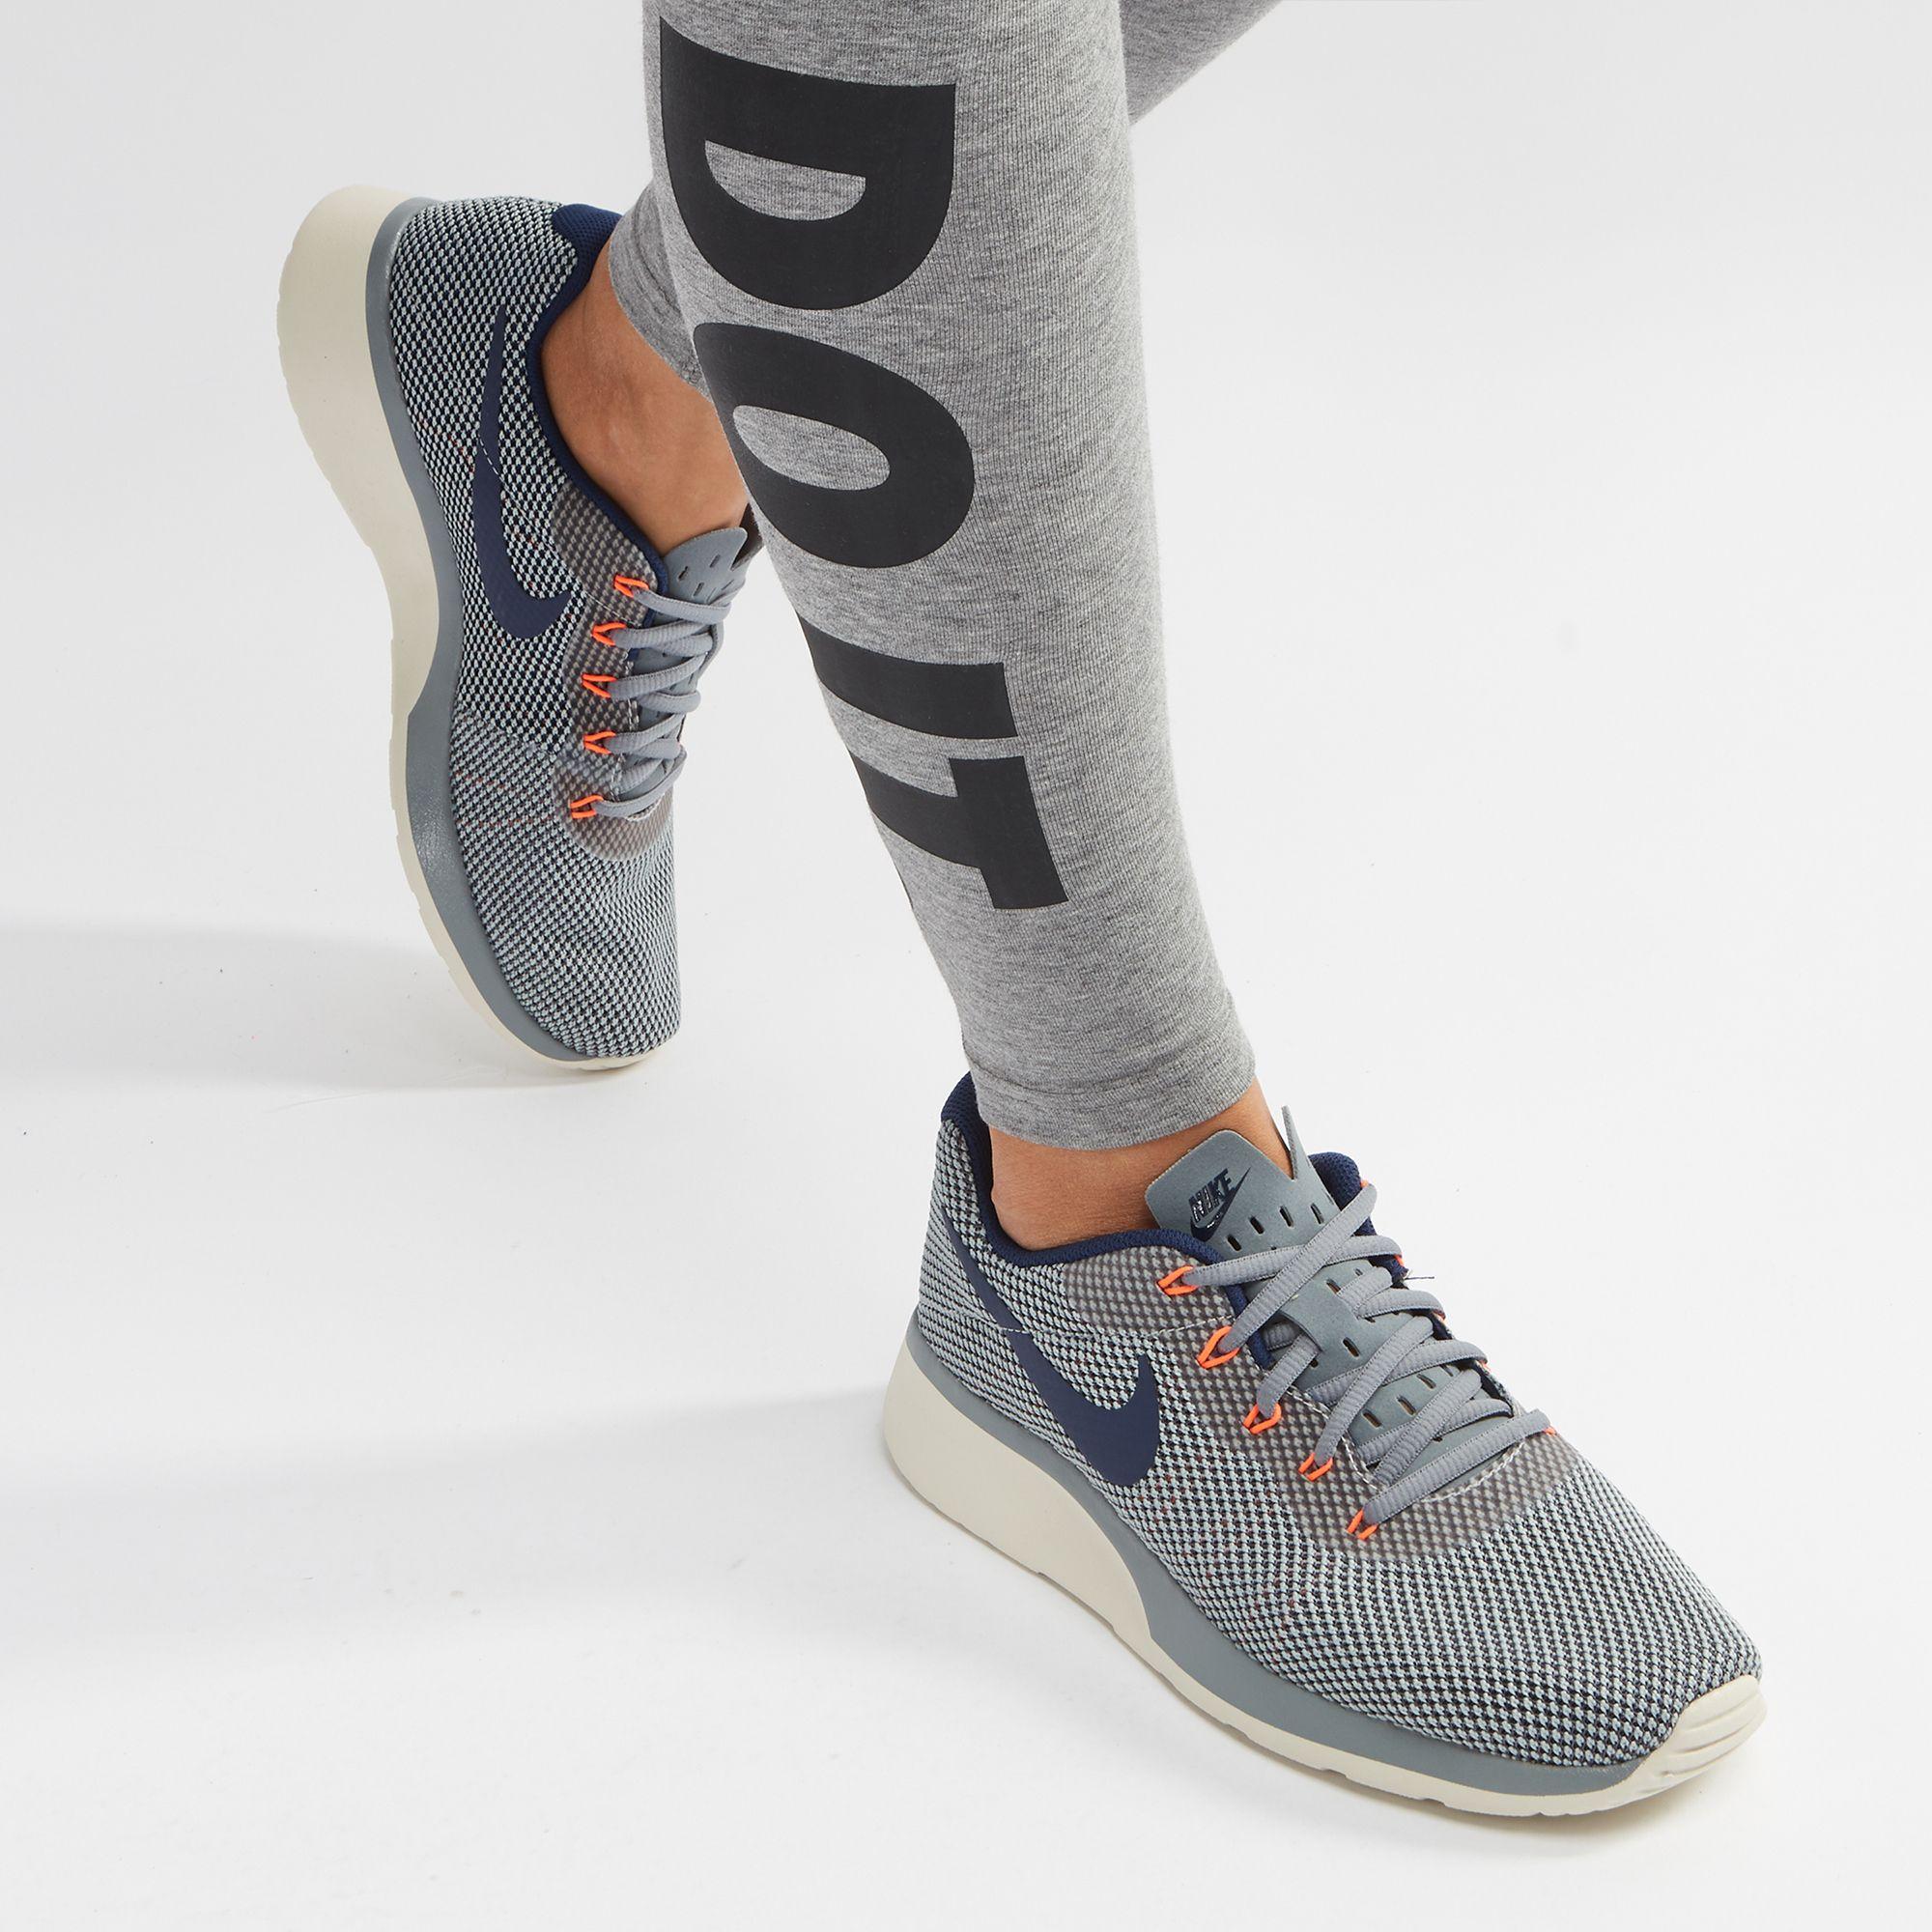 finest selection 3d363 00806 Nike Tanjun Racer Shoe